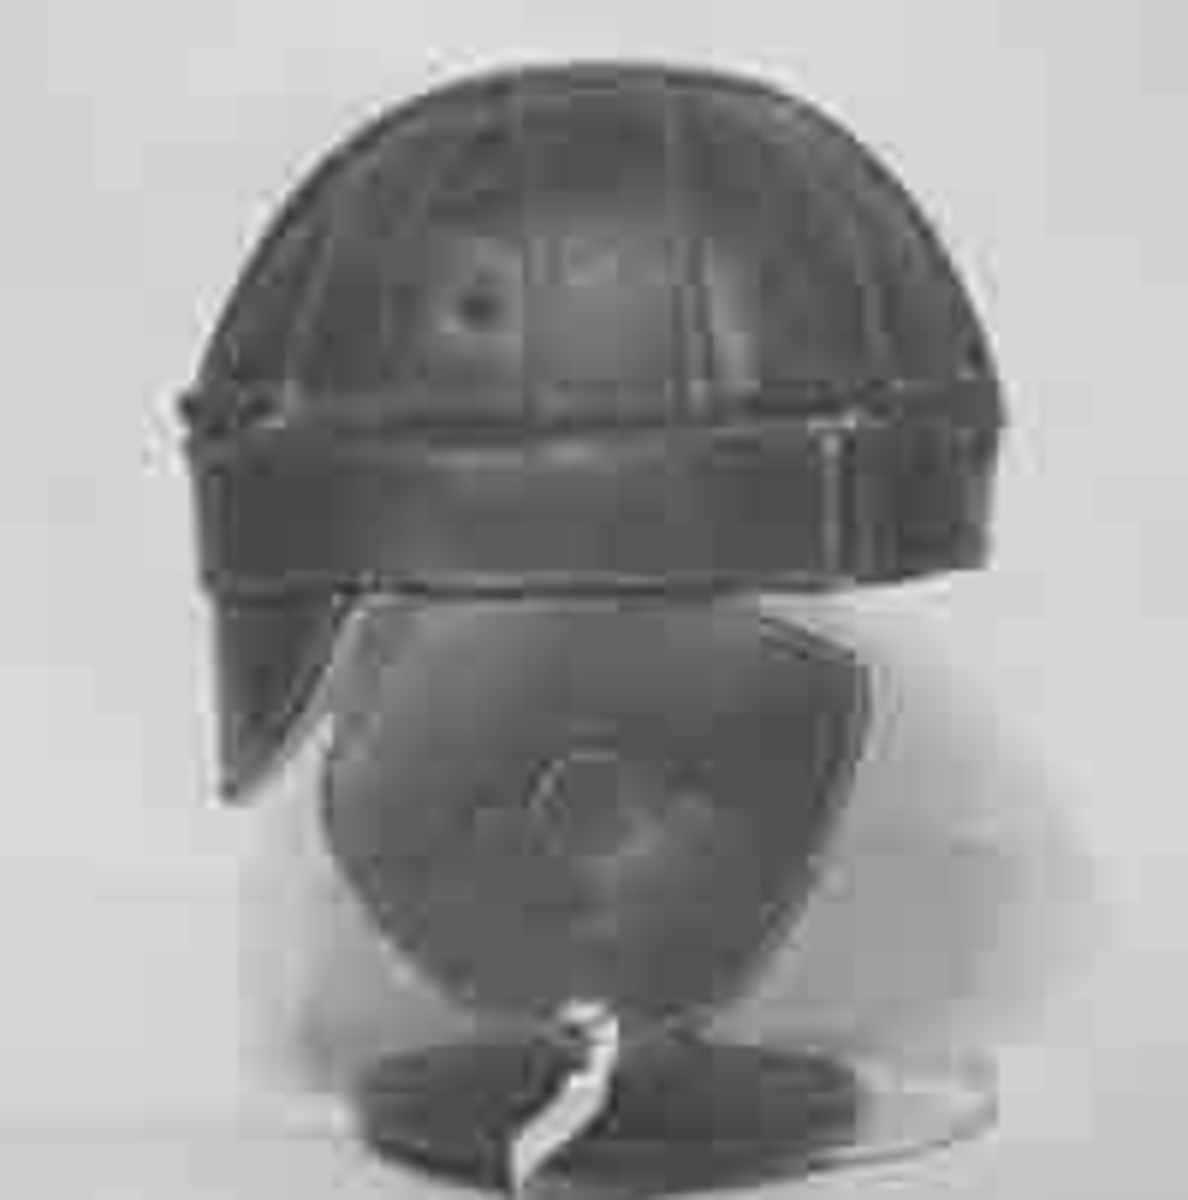 Helmet like that worn from 1916 - 1919